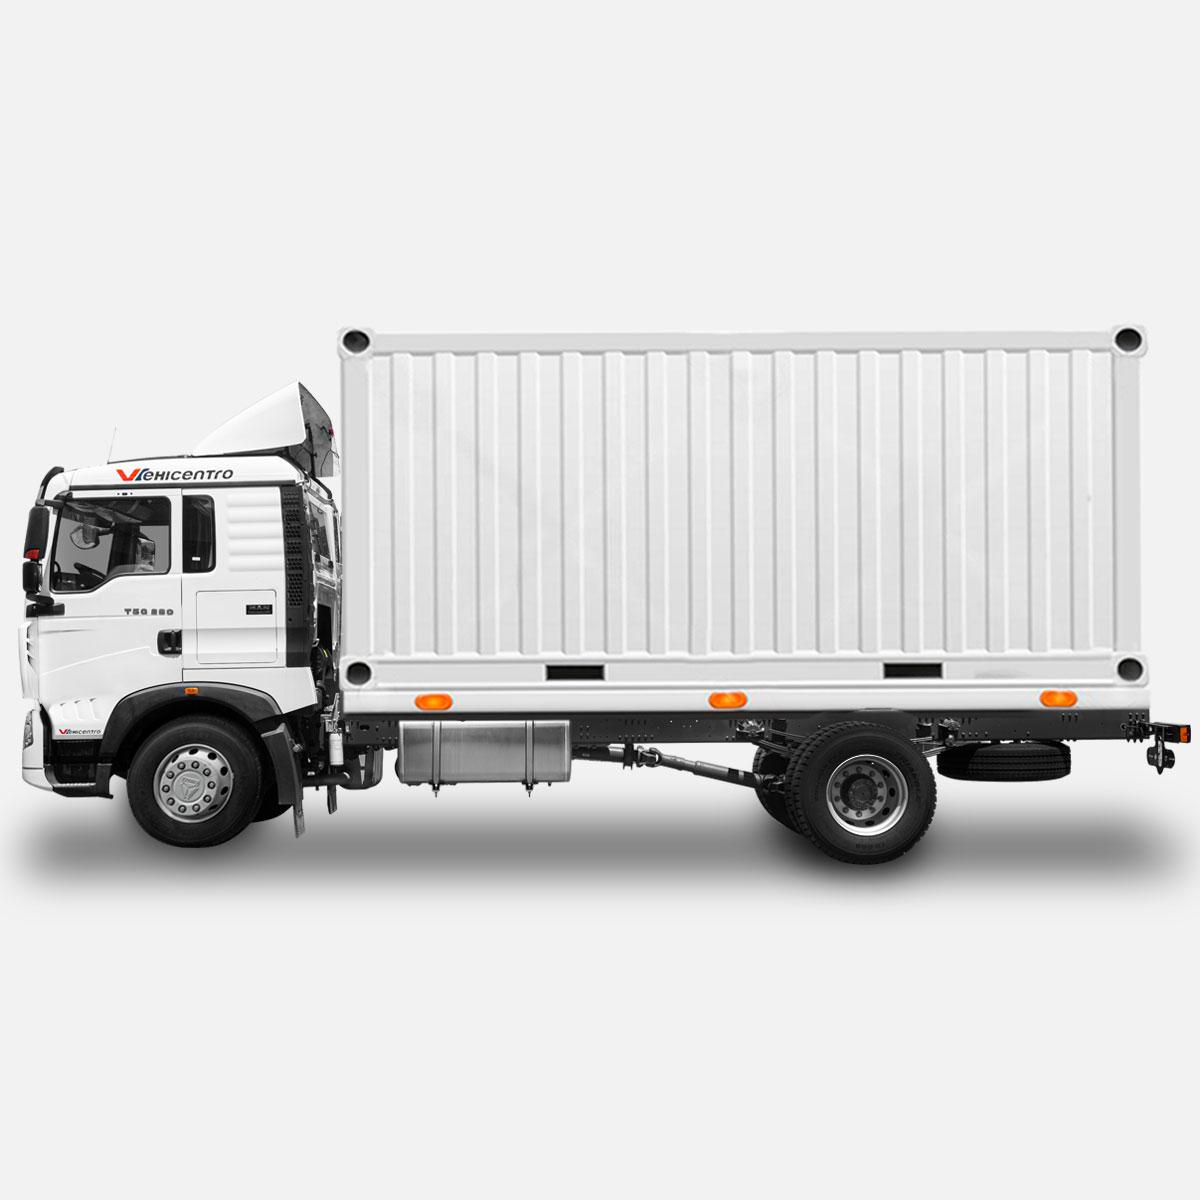 camion de 13 toneladas aplicaciones 2